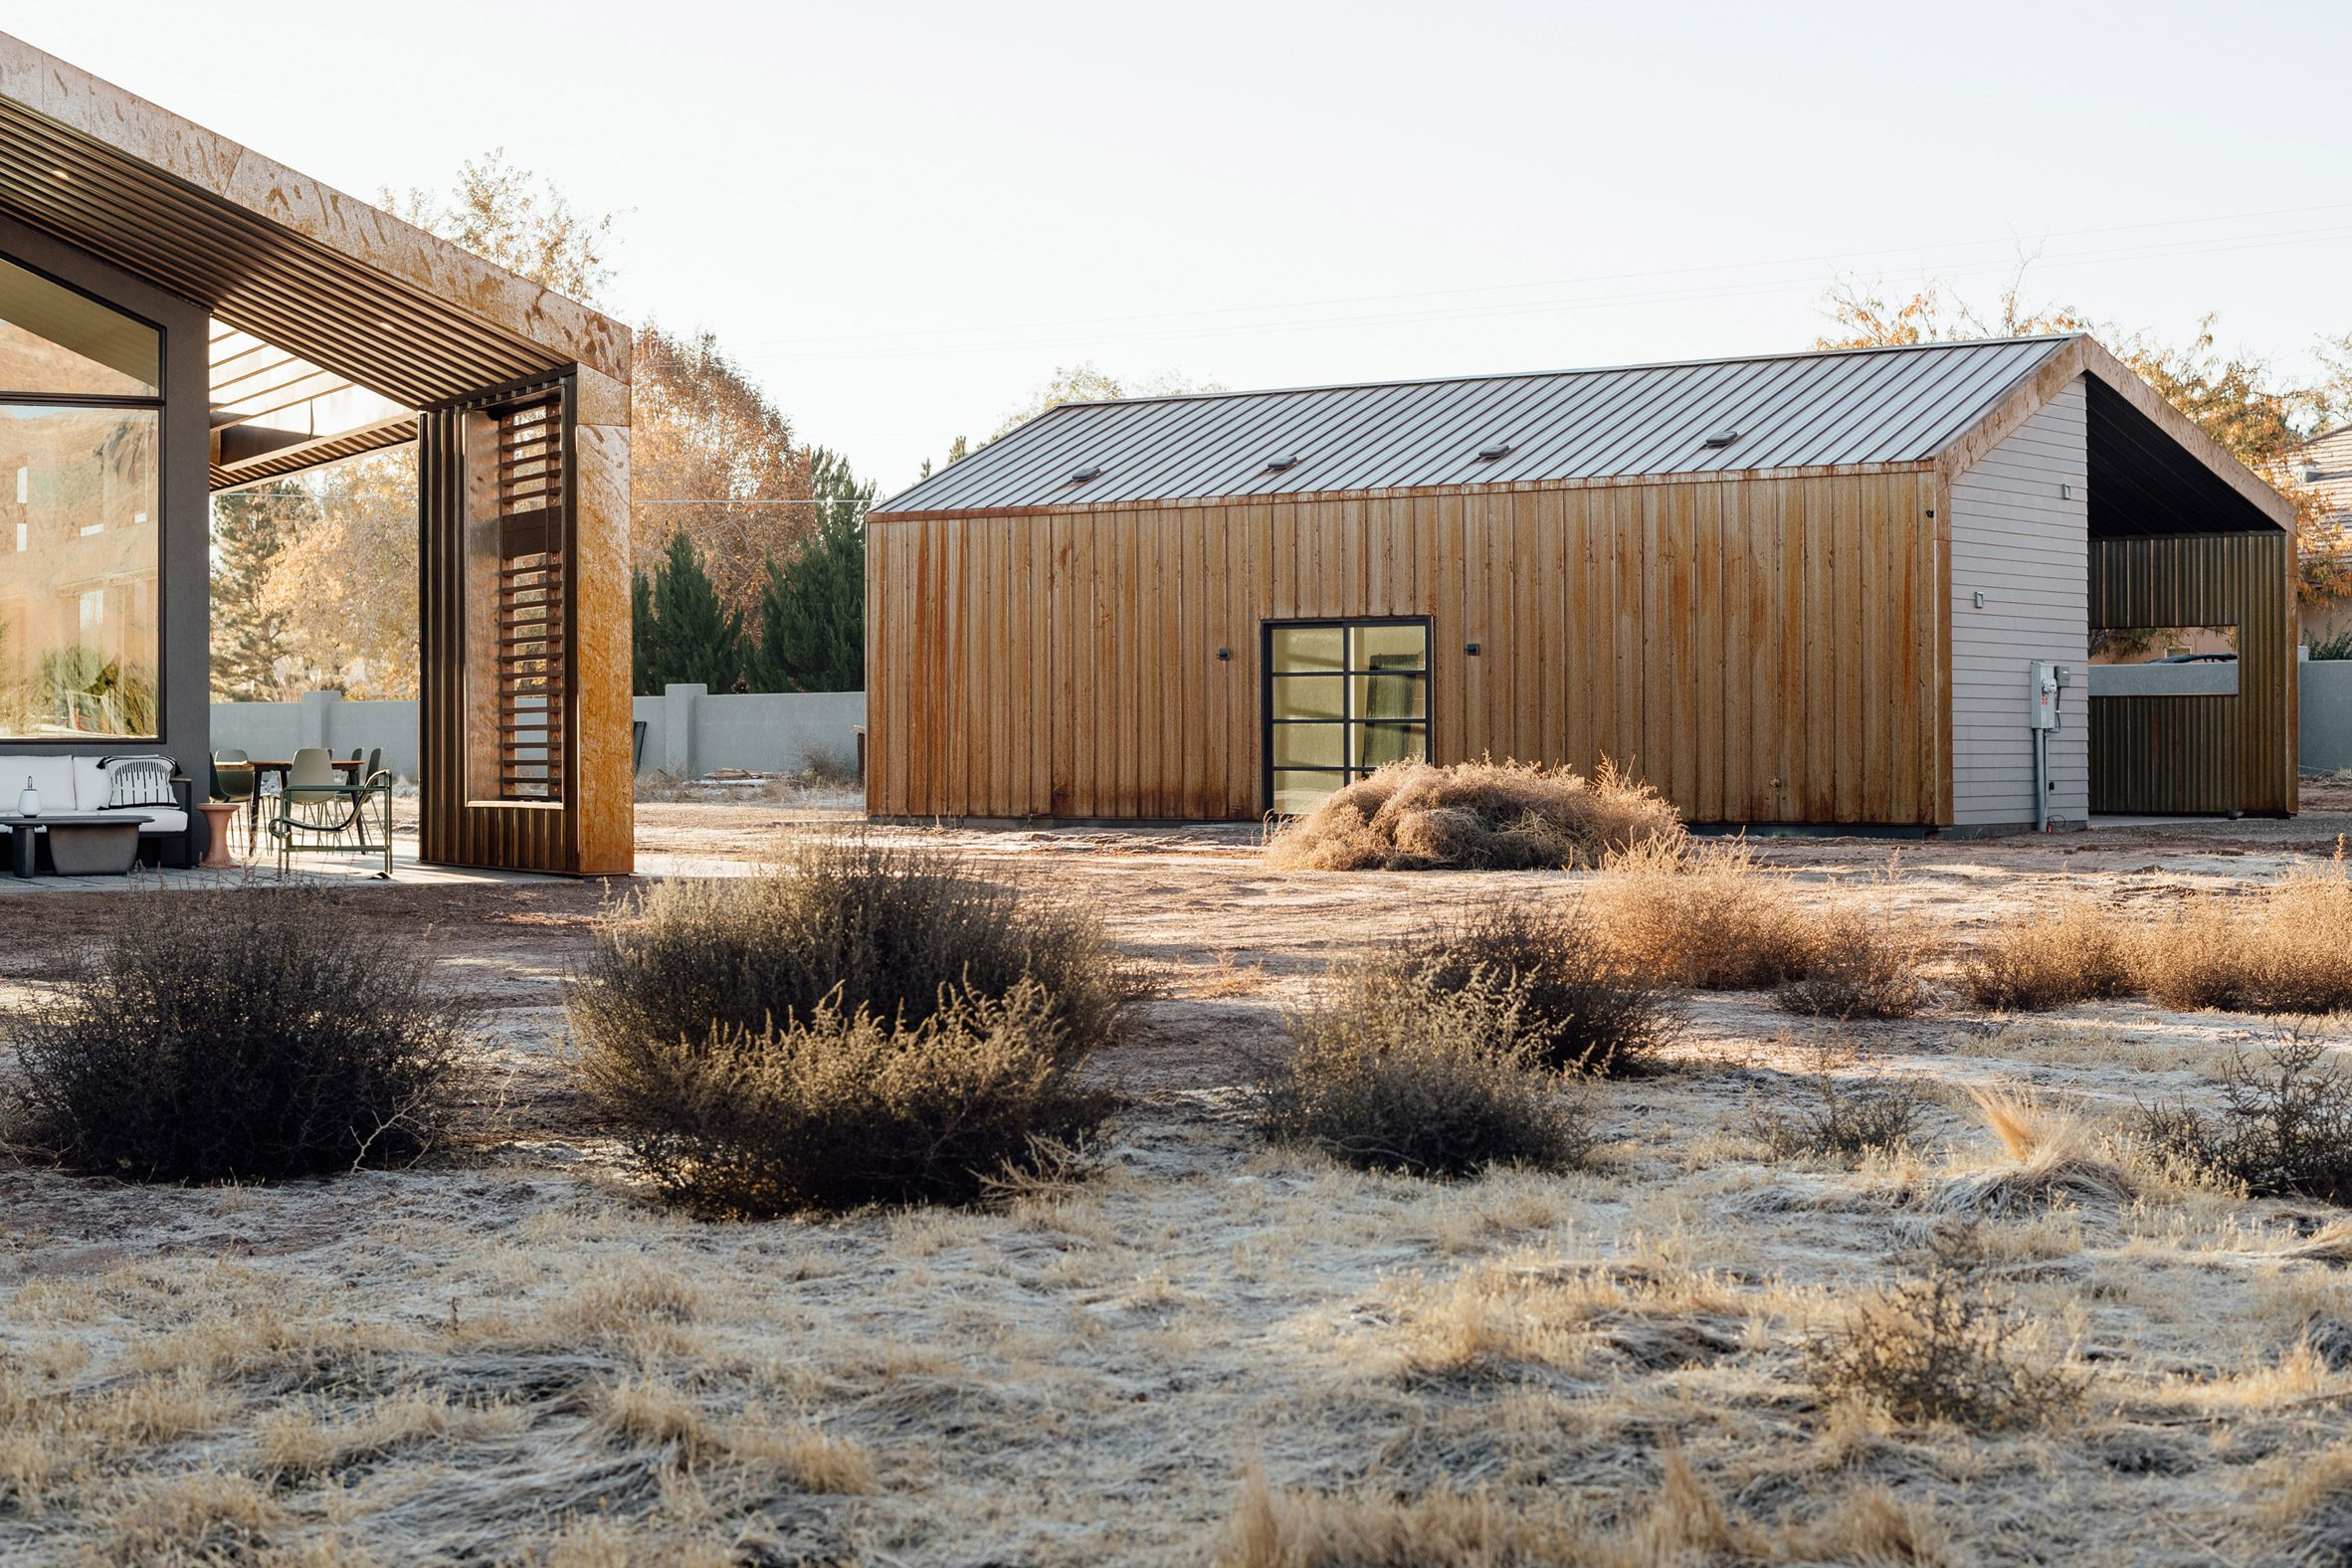 Studio Upwall Architects designed the project